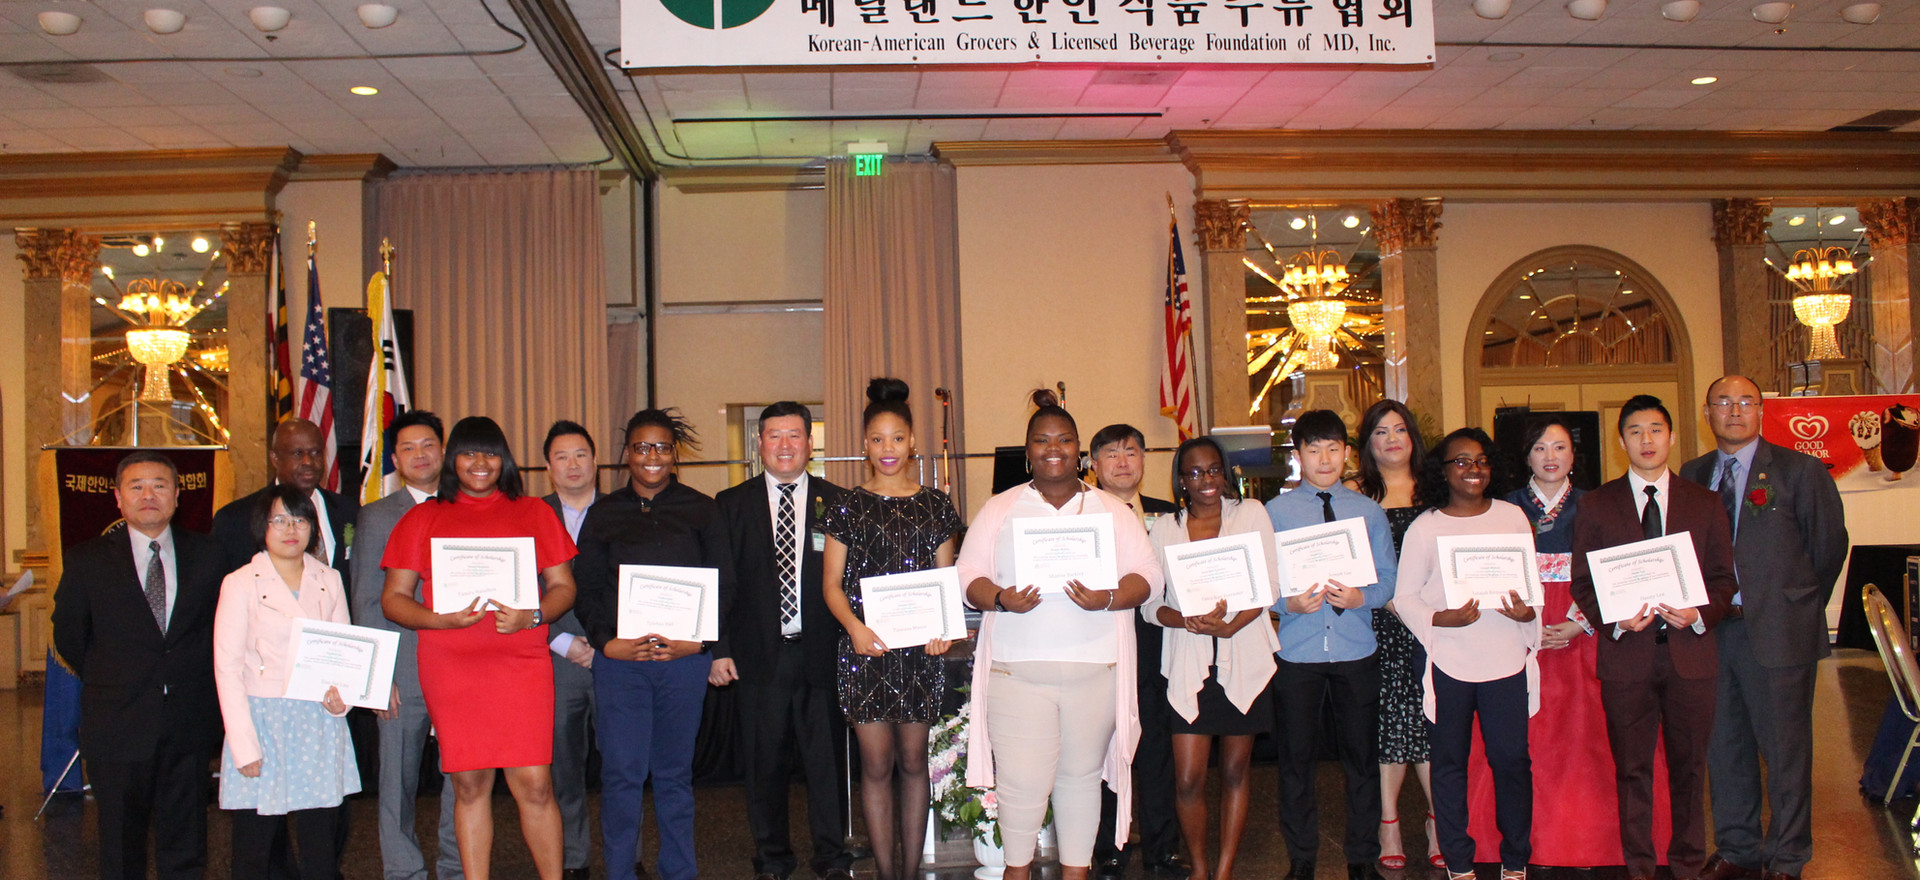 23rd Annual Scholarship Award Ceremony